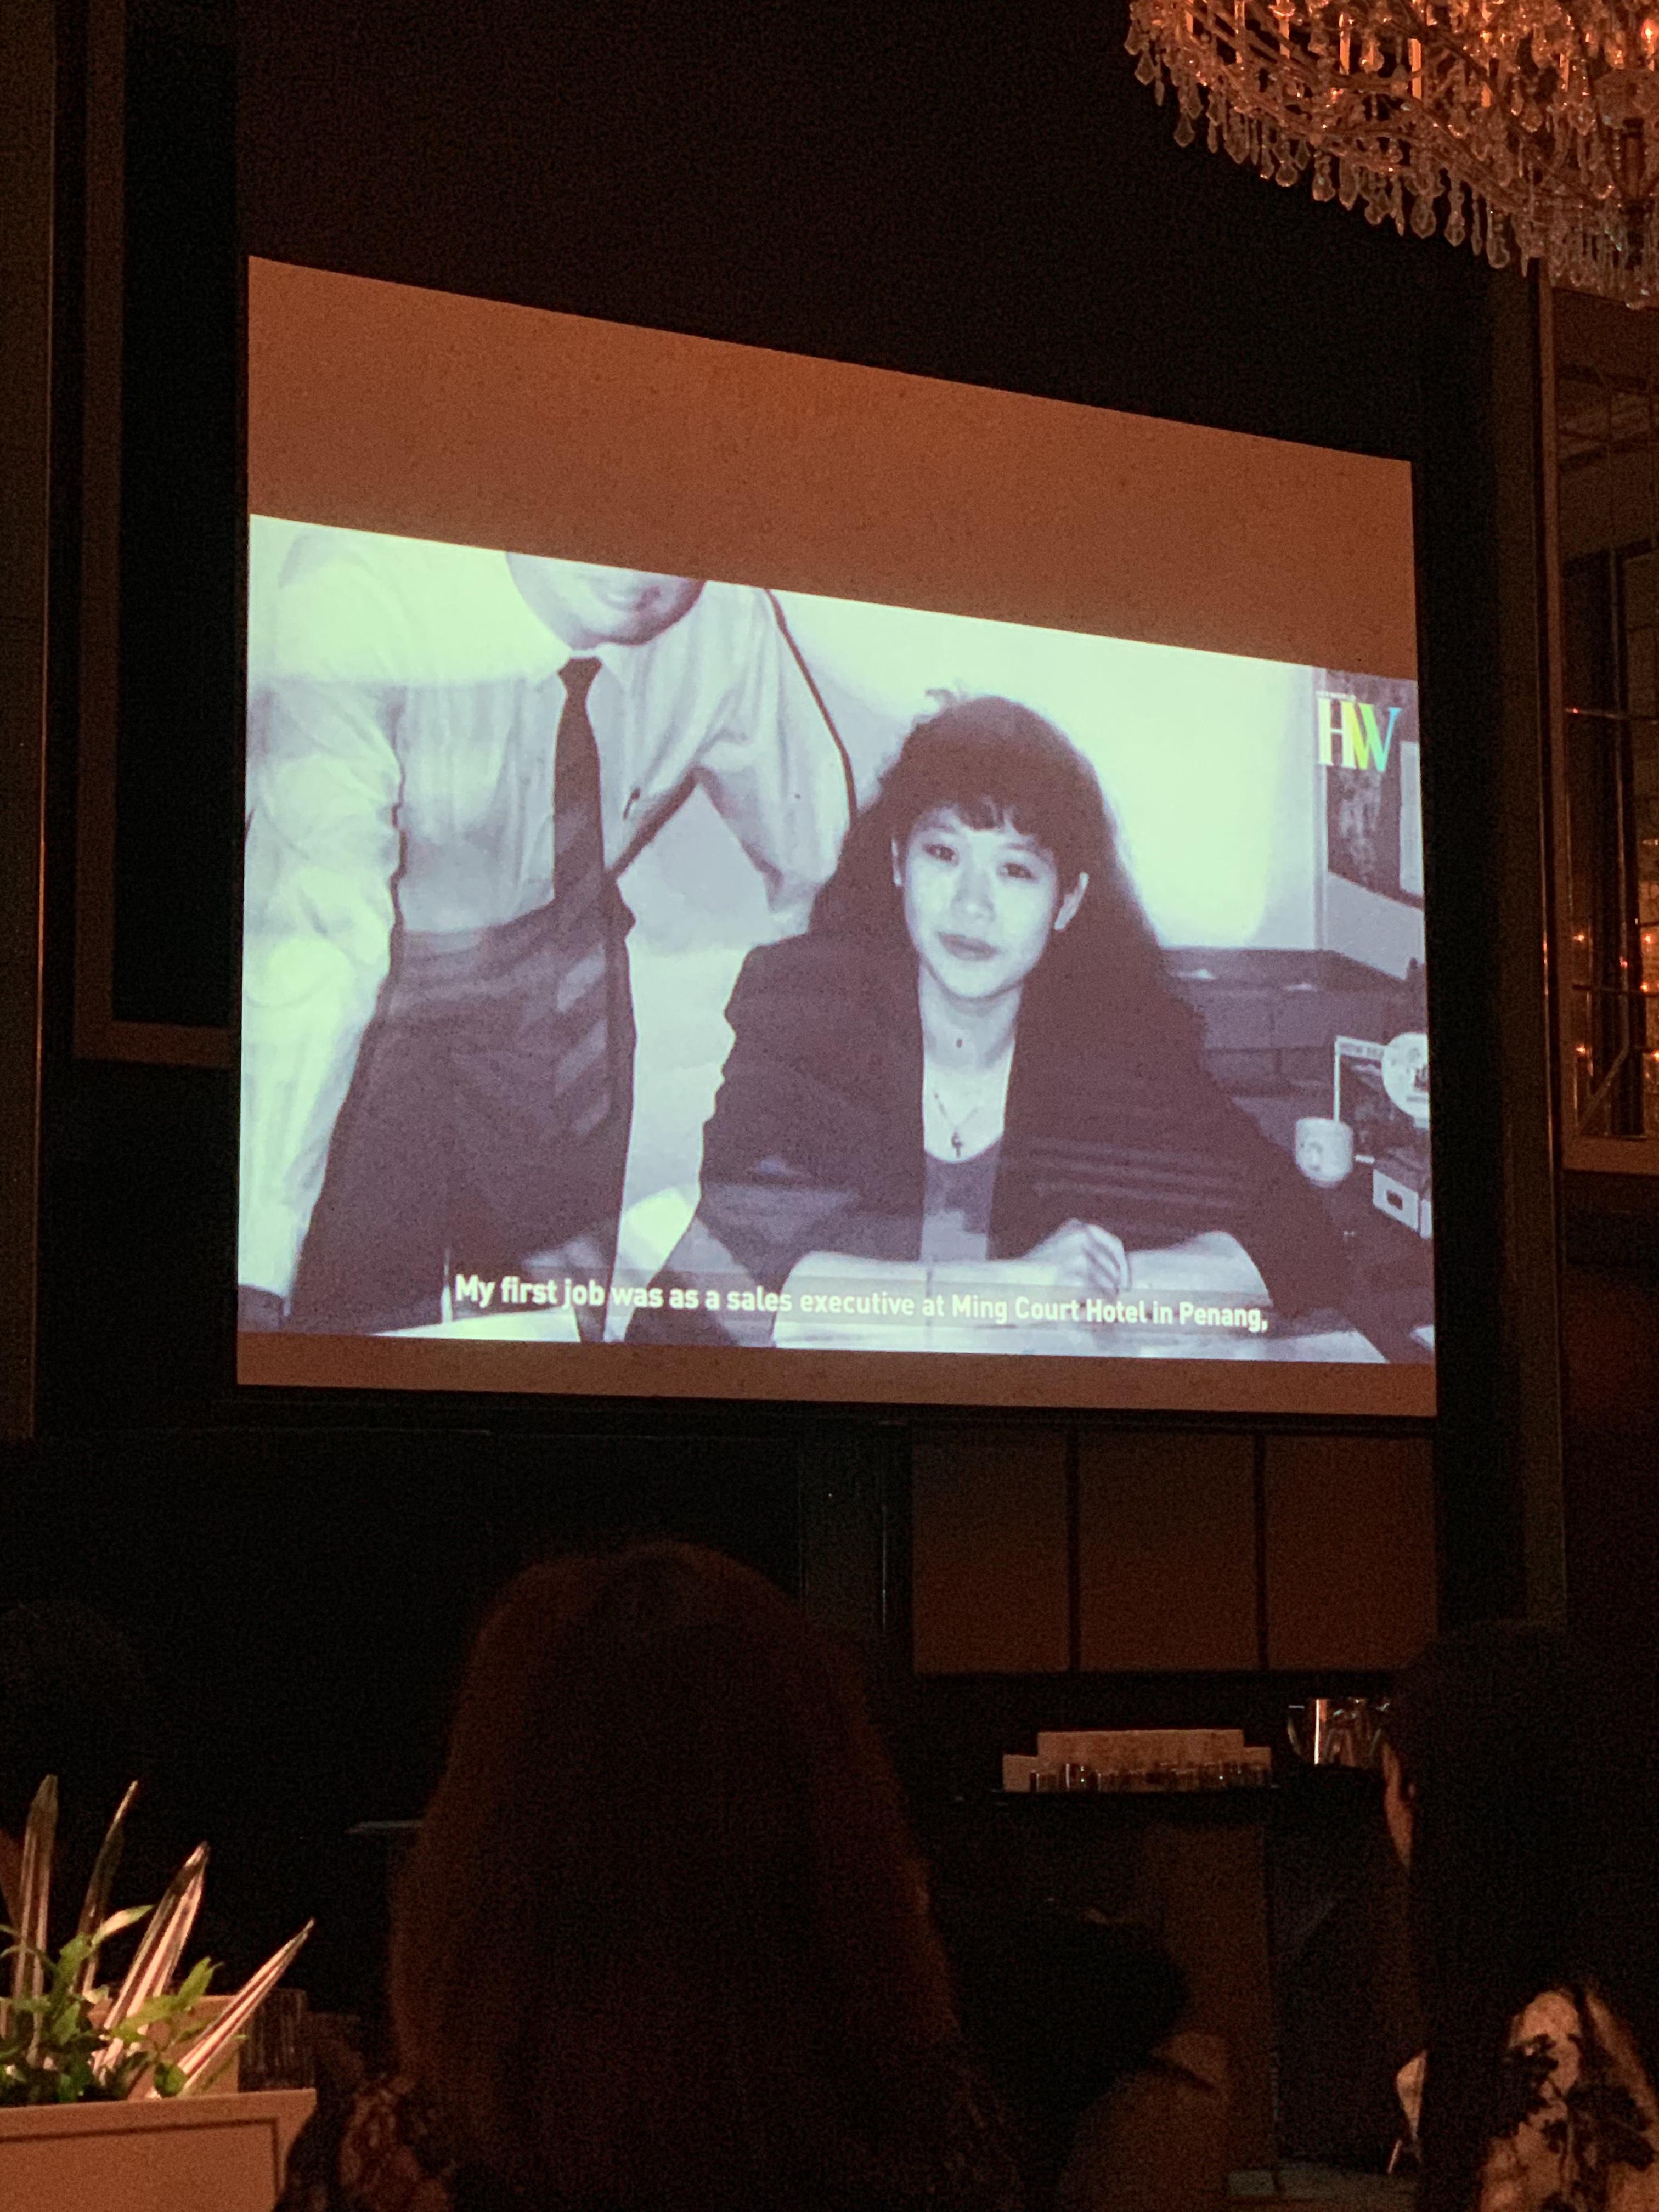 Clip of Susan Chong shown at the Her World gala.